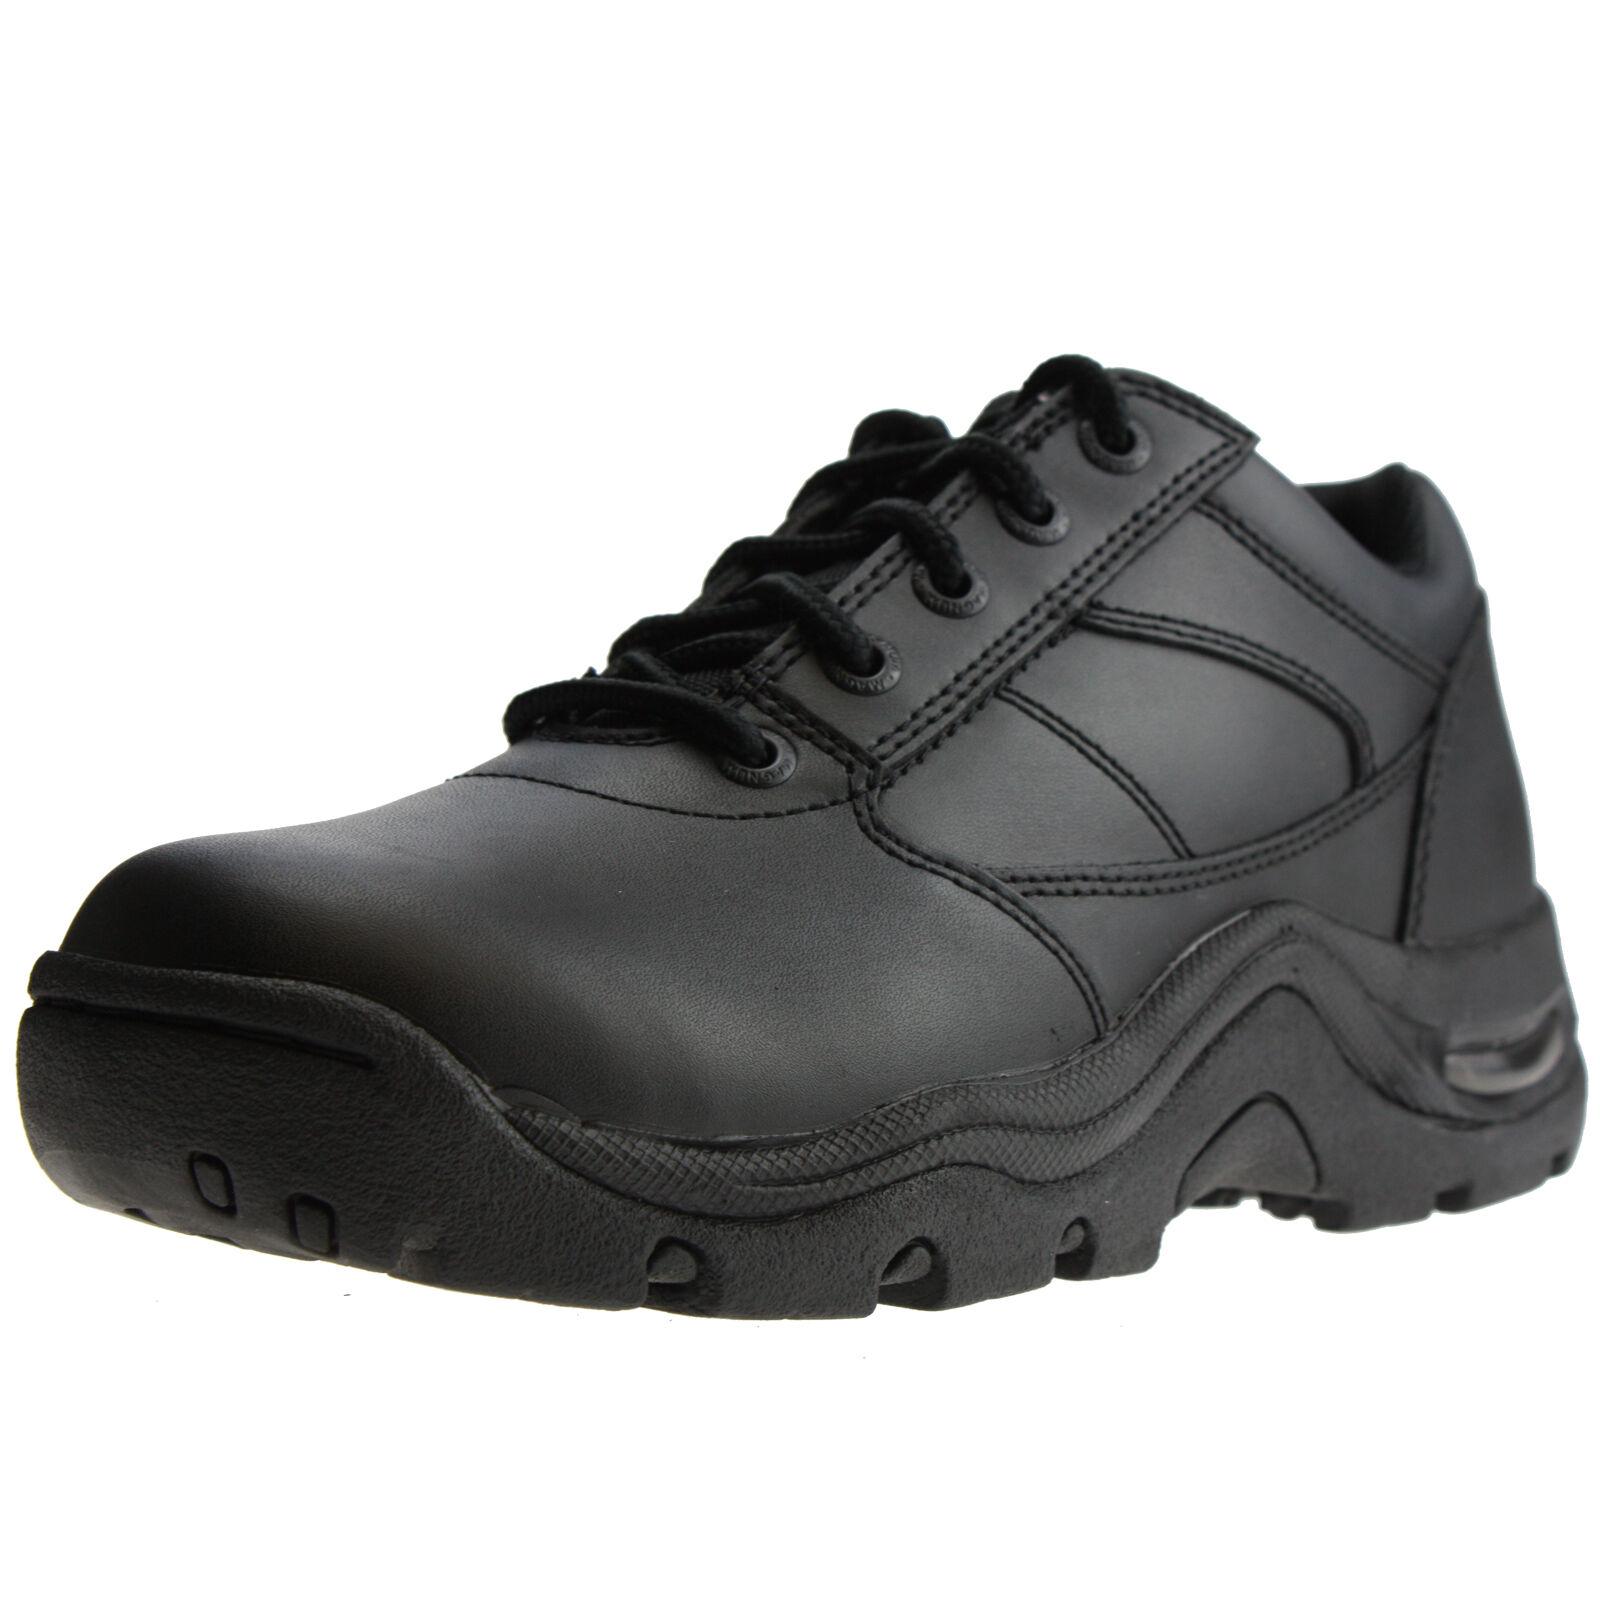 HI-TEC Magnum Viper Low Halbschuhe Einsatz Uniform Security Schuhe Halbschuhe Low schwarz Leder 5b45ff